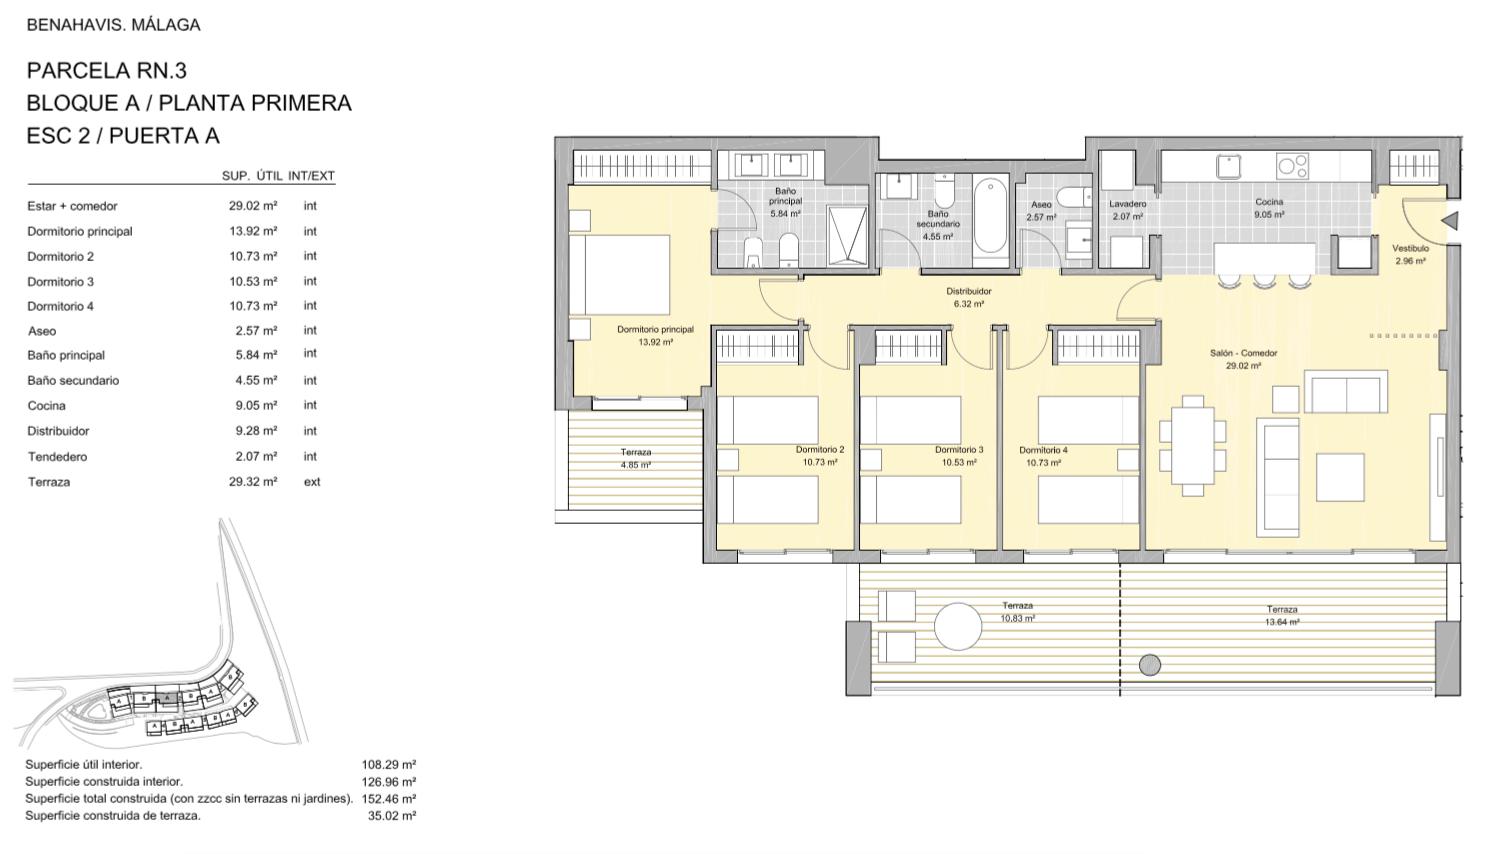 alborada homes benahavis golf la quinta moderne appartementen penthouses te koop grondplan RN3 21A verdieping 4bed